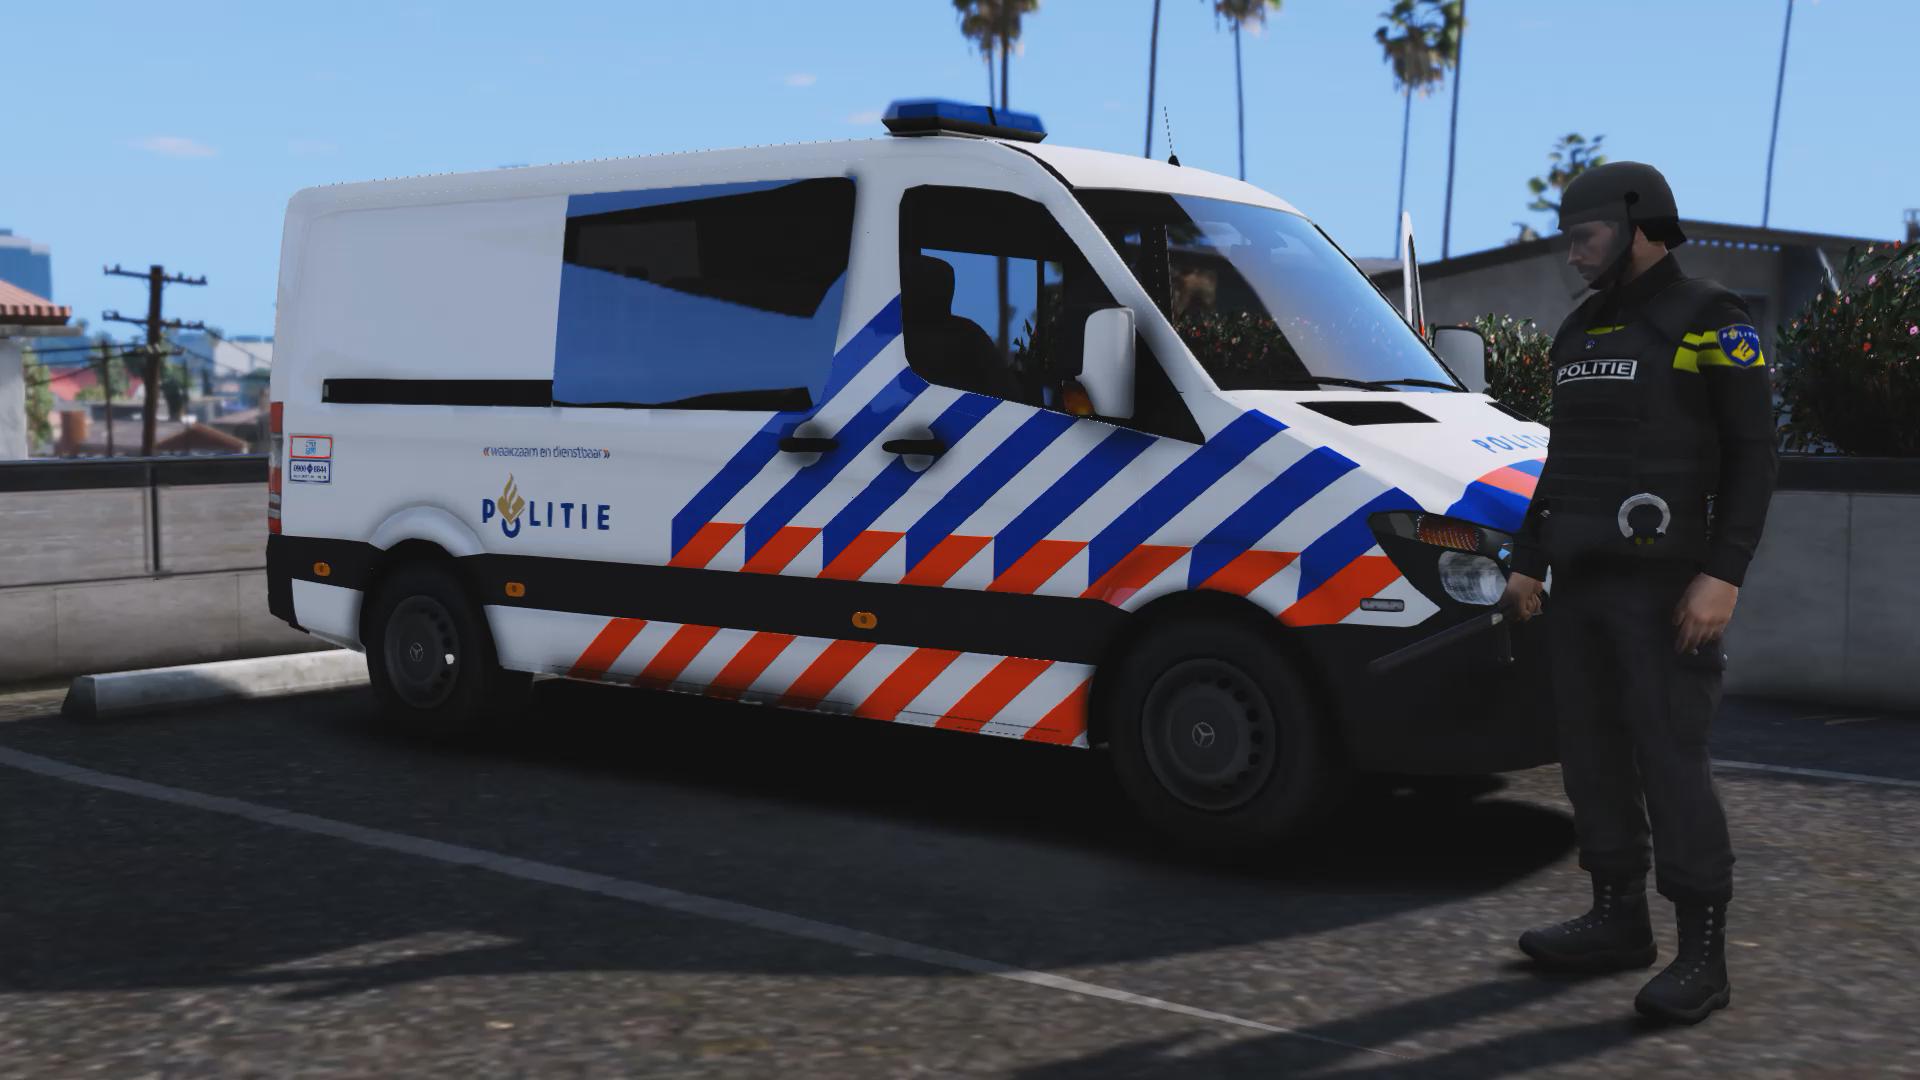 Mb Sprinter 2018 >> Mobiele Eenheid Mercedes Sprinter Nederlandse Politie - Mobile Unit Mercedes Sprinter Dutch ...